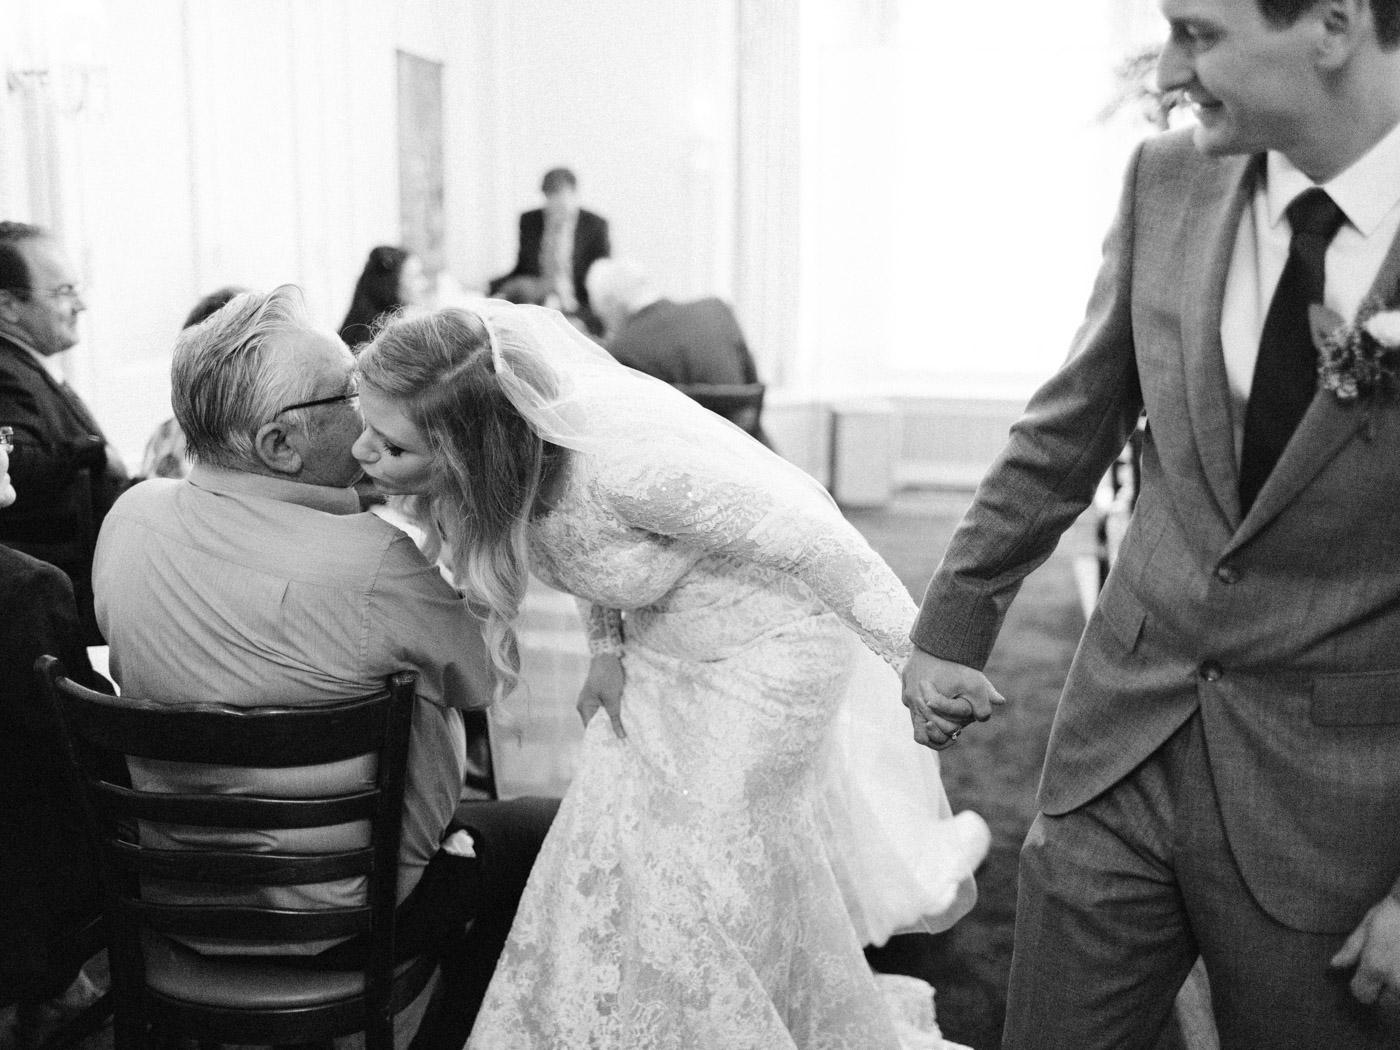 Toronto-wedding-photographer-intimate-classic-fine-art-elopement-ottawa34.jpg